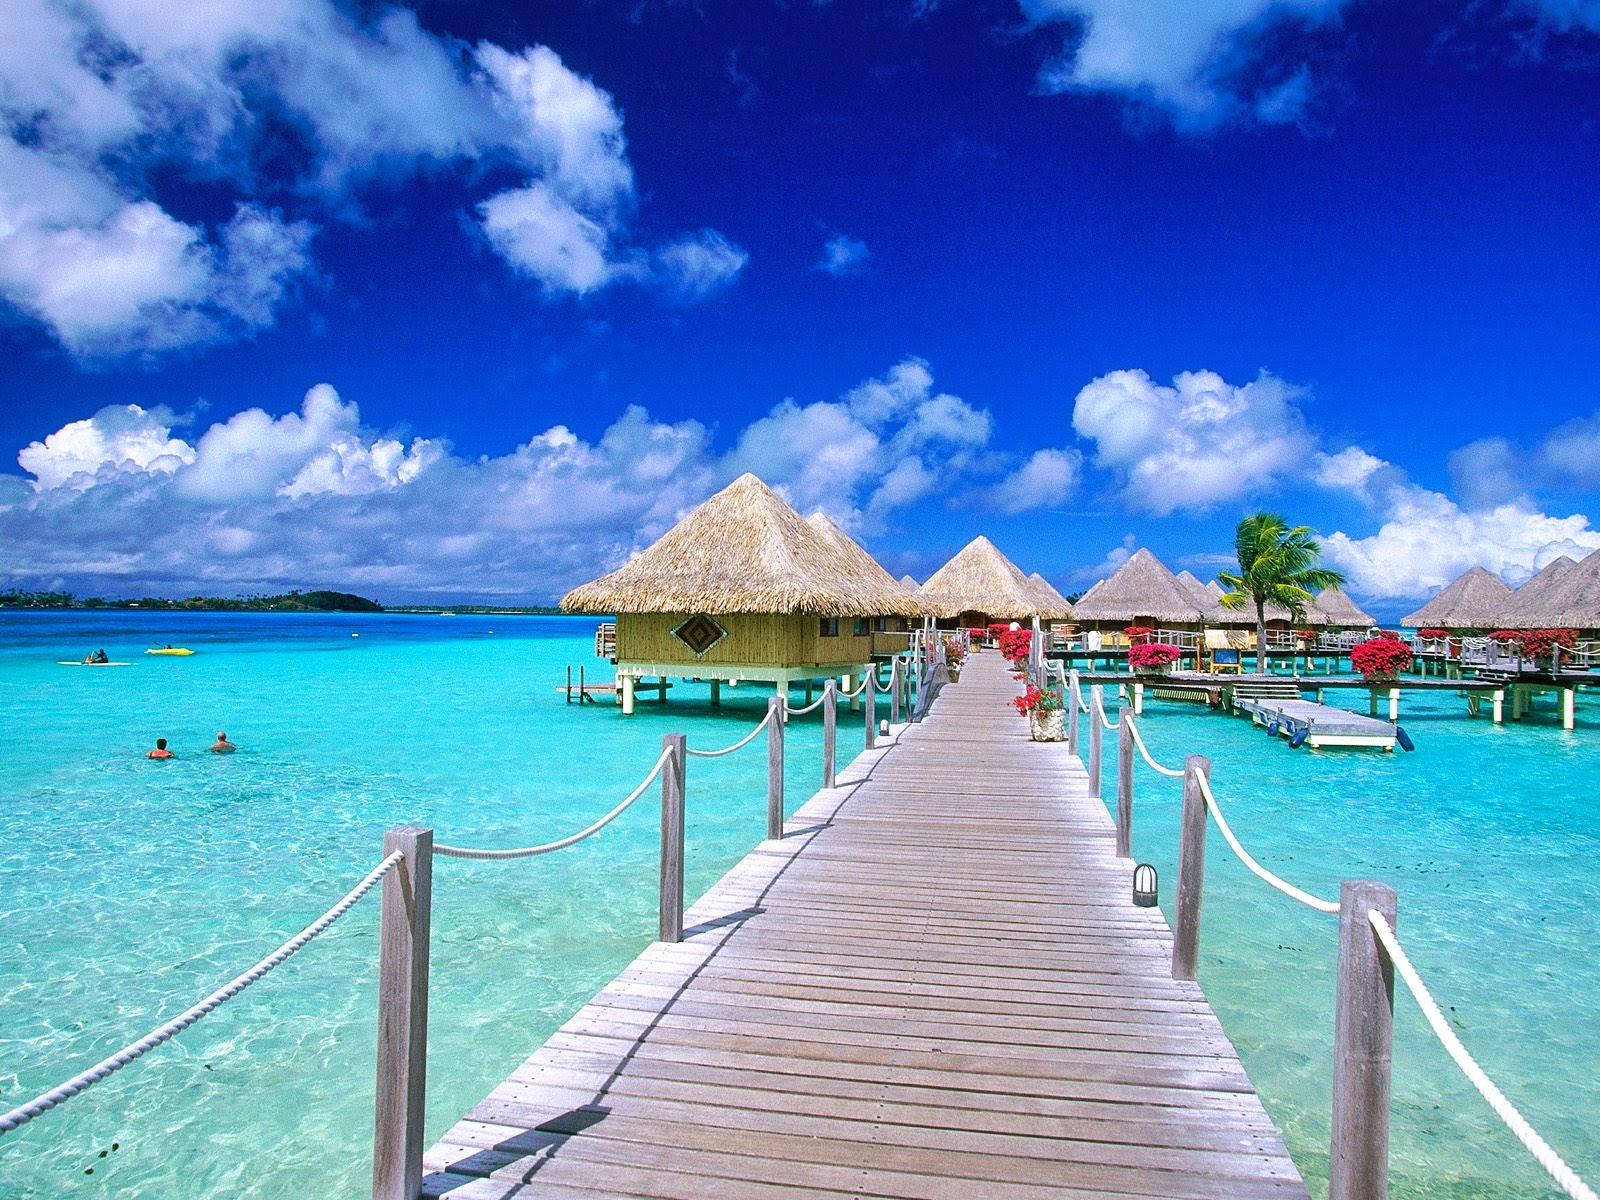 beautiful beach picture Tropical Beach Desktop Wallpaper Yalanpara 1600x1200